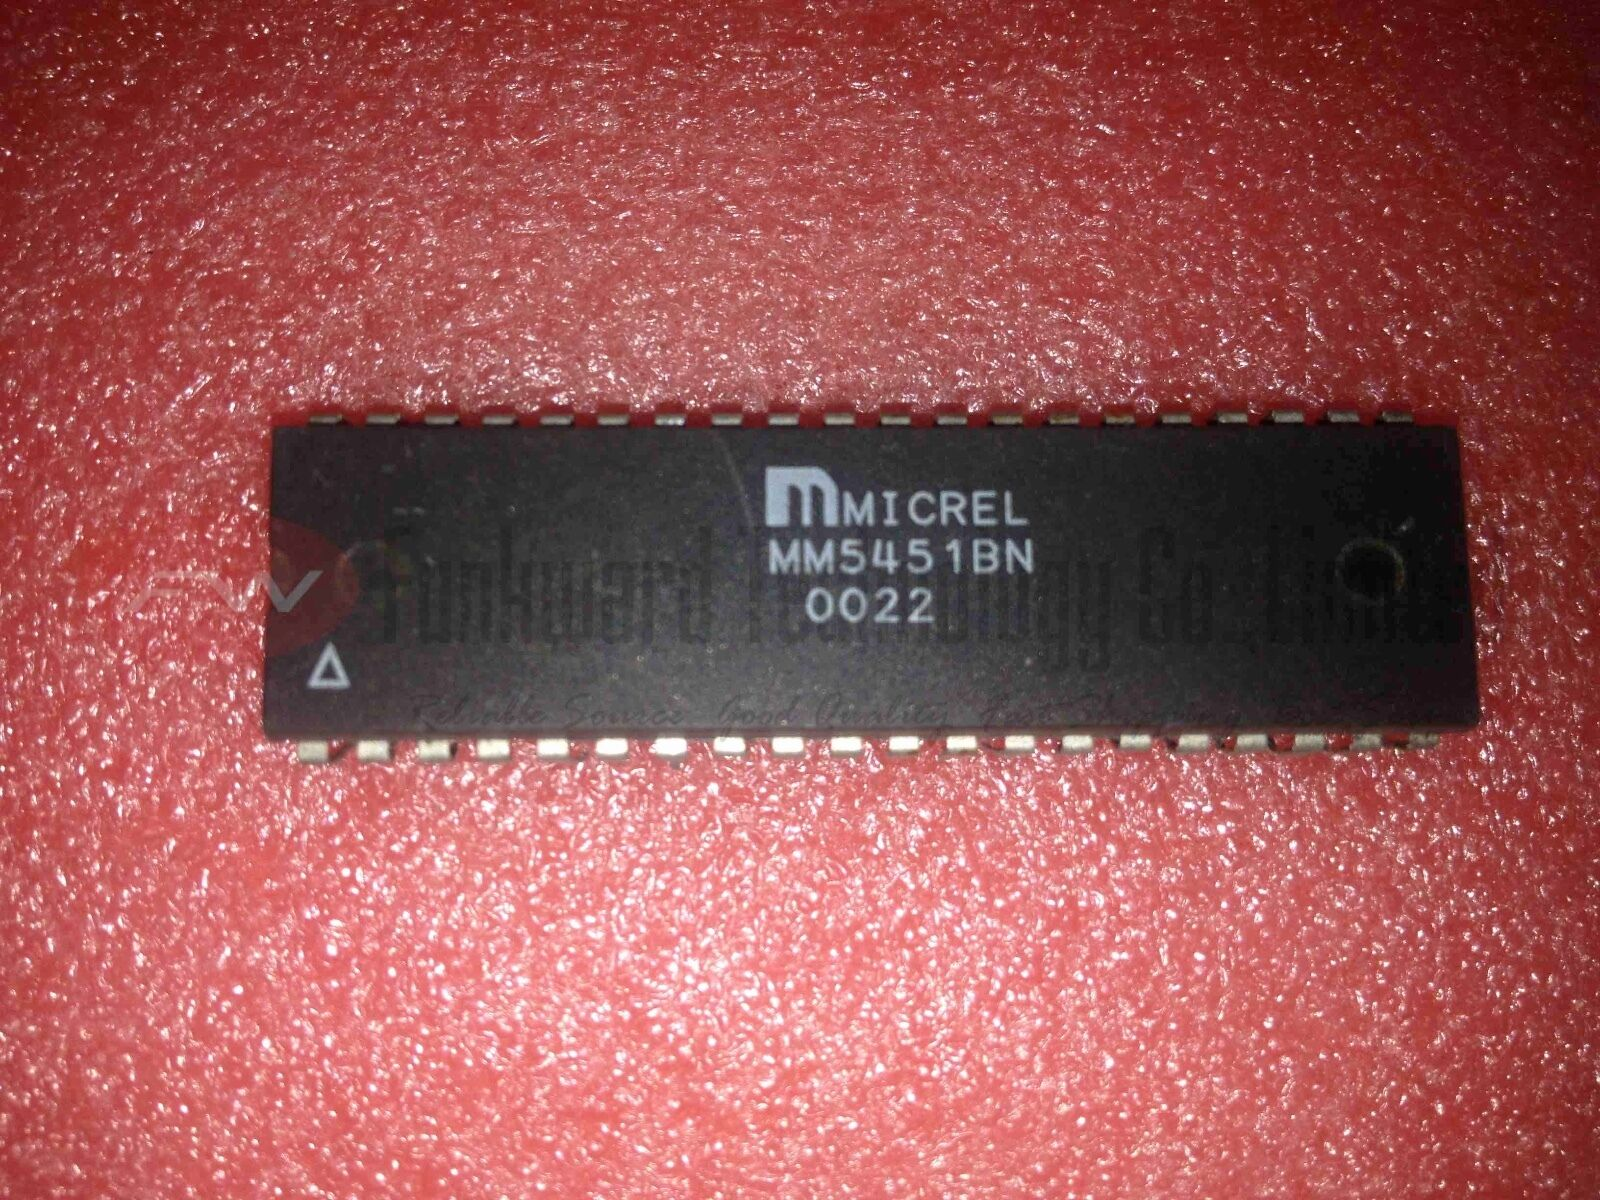 STMicroelectronics M5451B7 LED Display Driver PDIP40 x 1pc